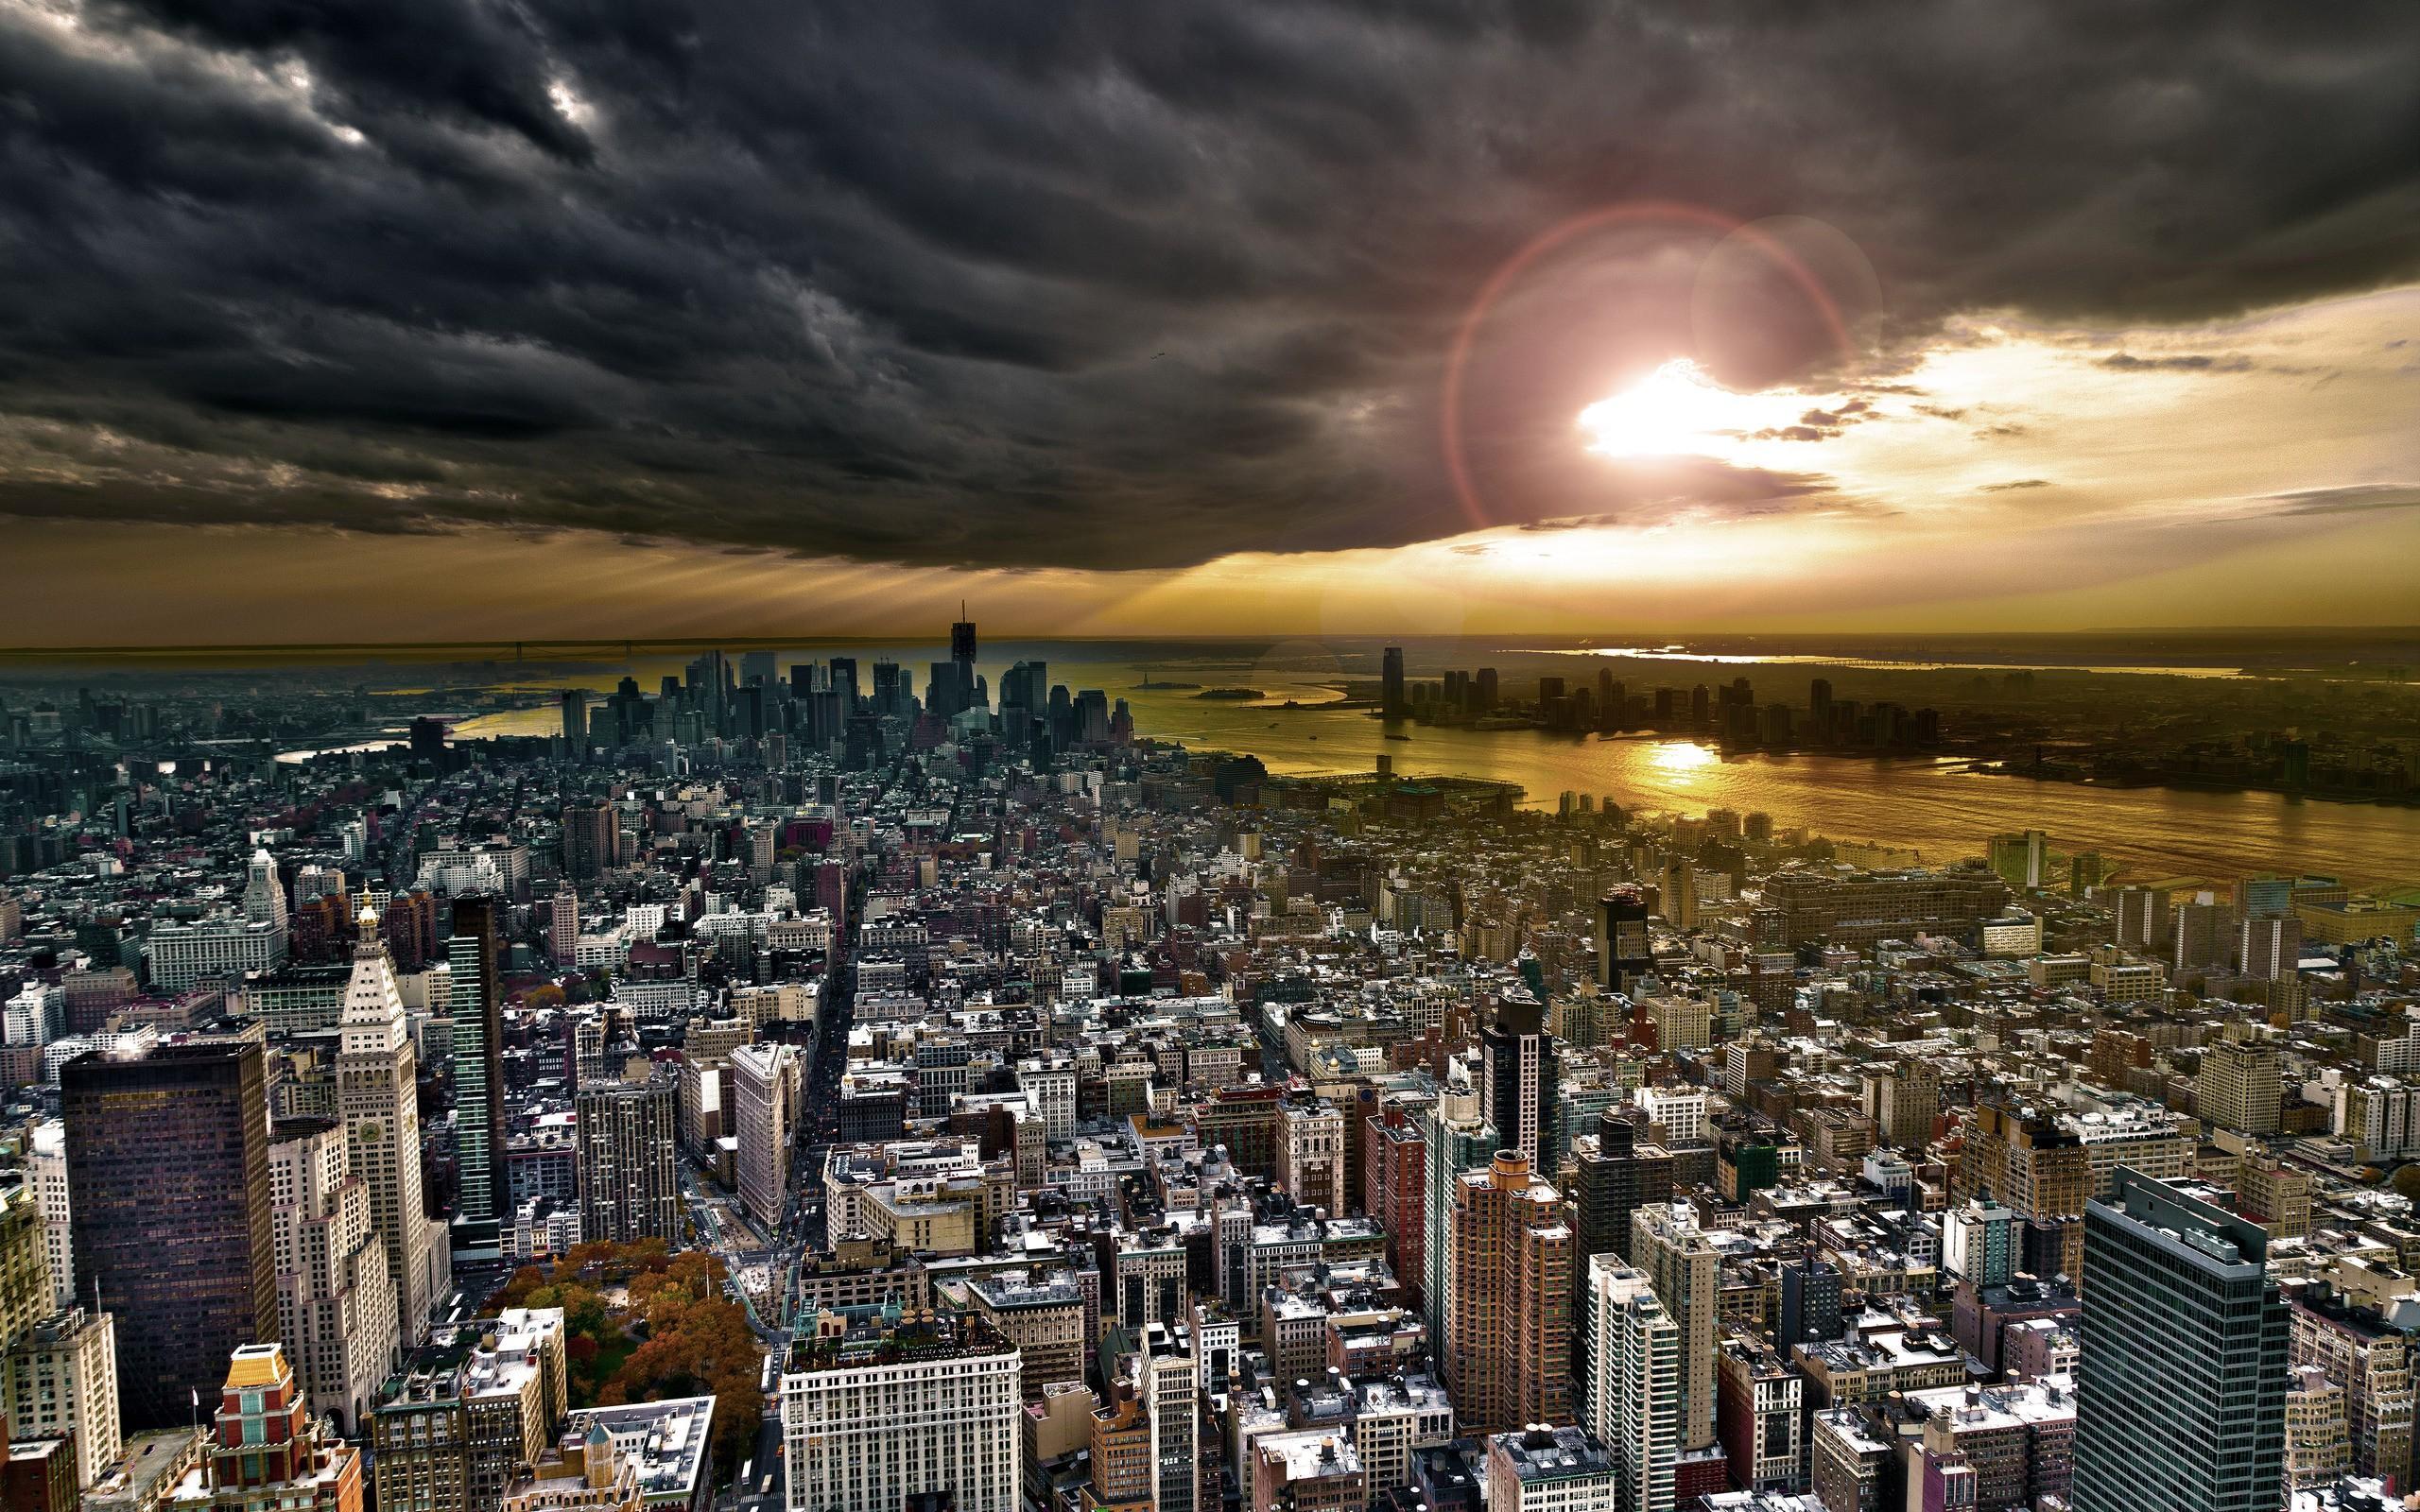 New York City Skyline Wallpaper 4K Wide Screen Wallpaper 1080p2K4K 2560x1600